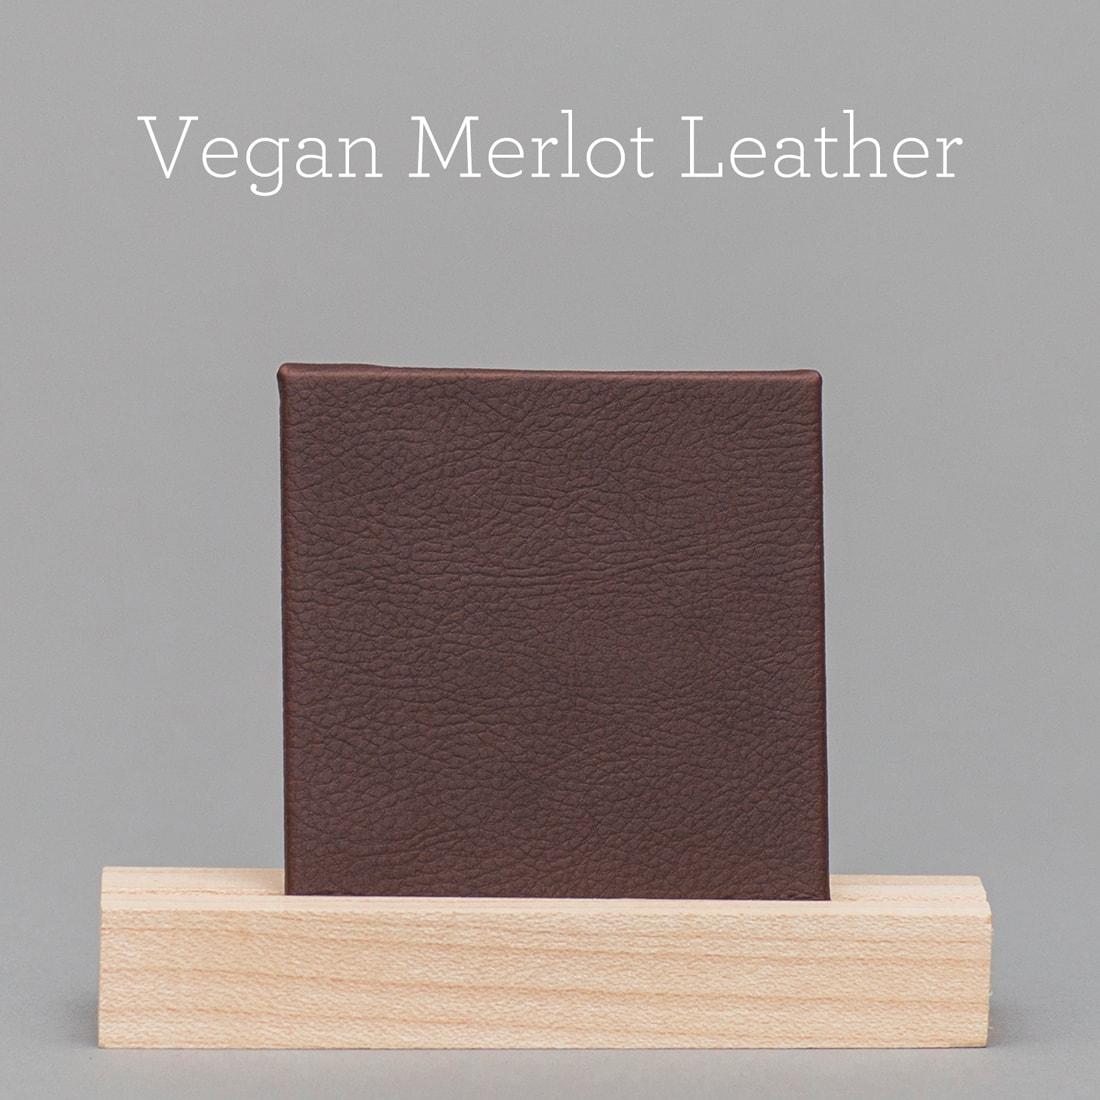 MerlotLeather